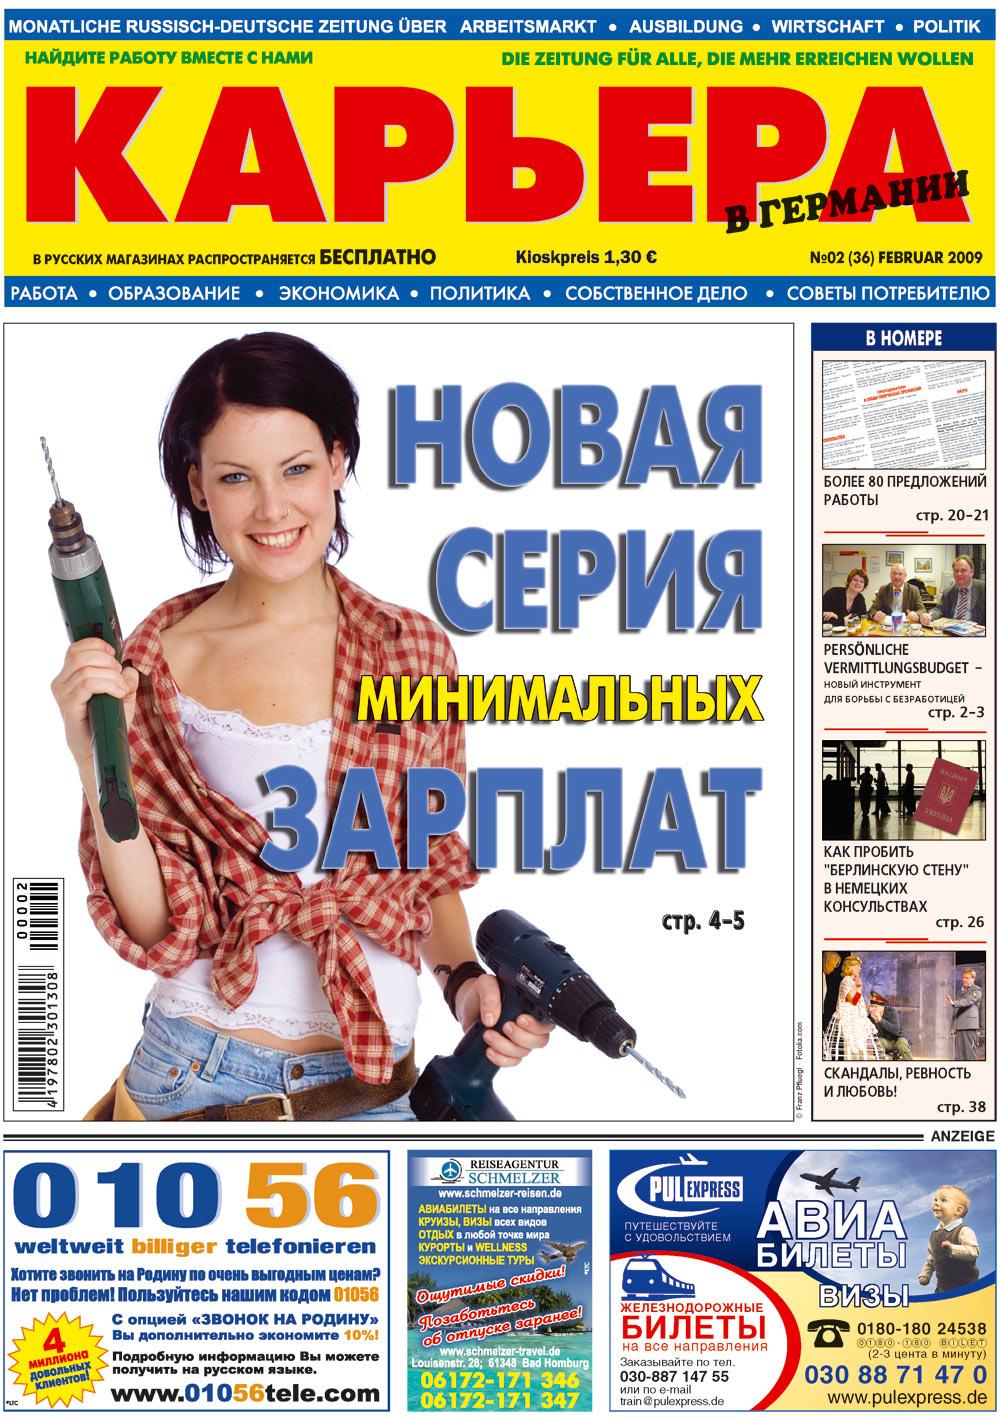 Карьера (газета). 2009 год, номер 2, стр. 1